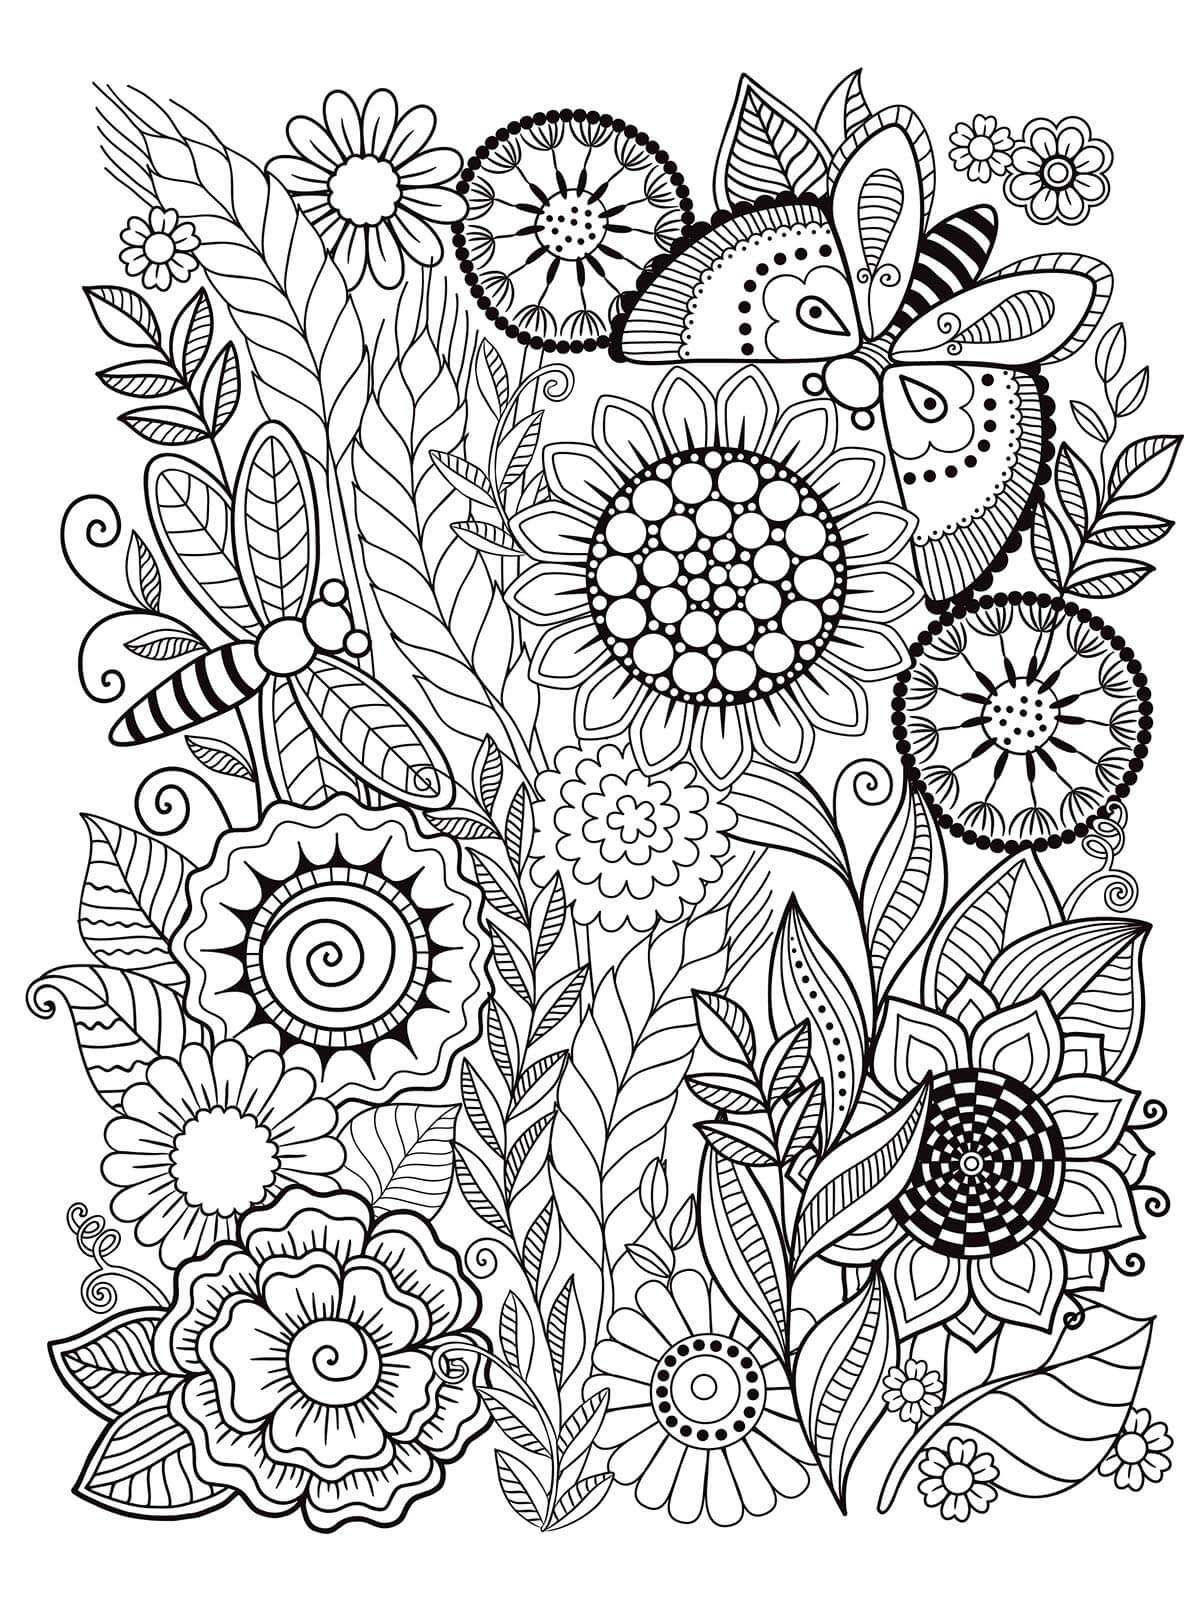 Flower Mindfulness 3